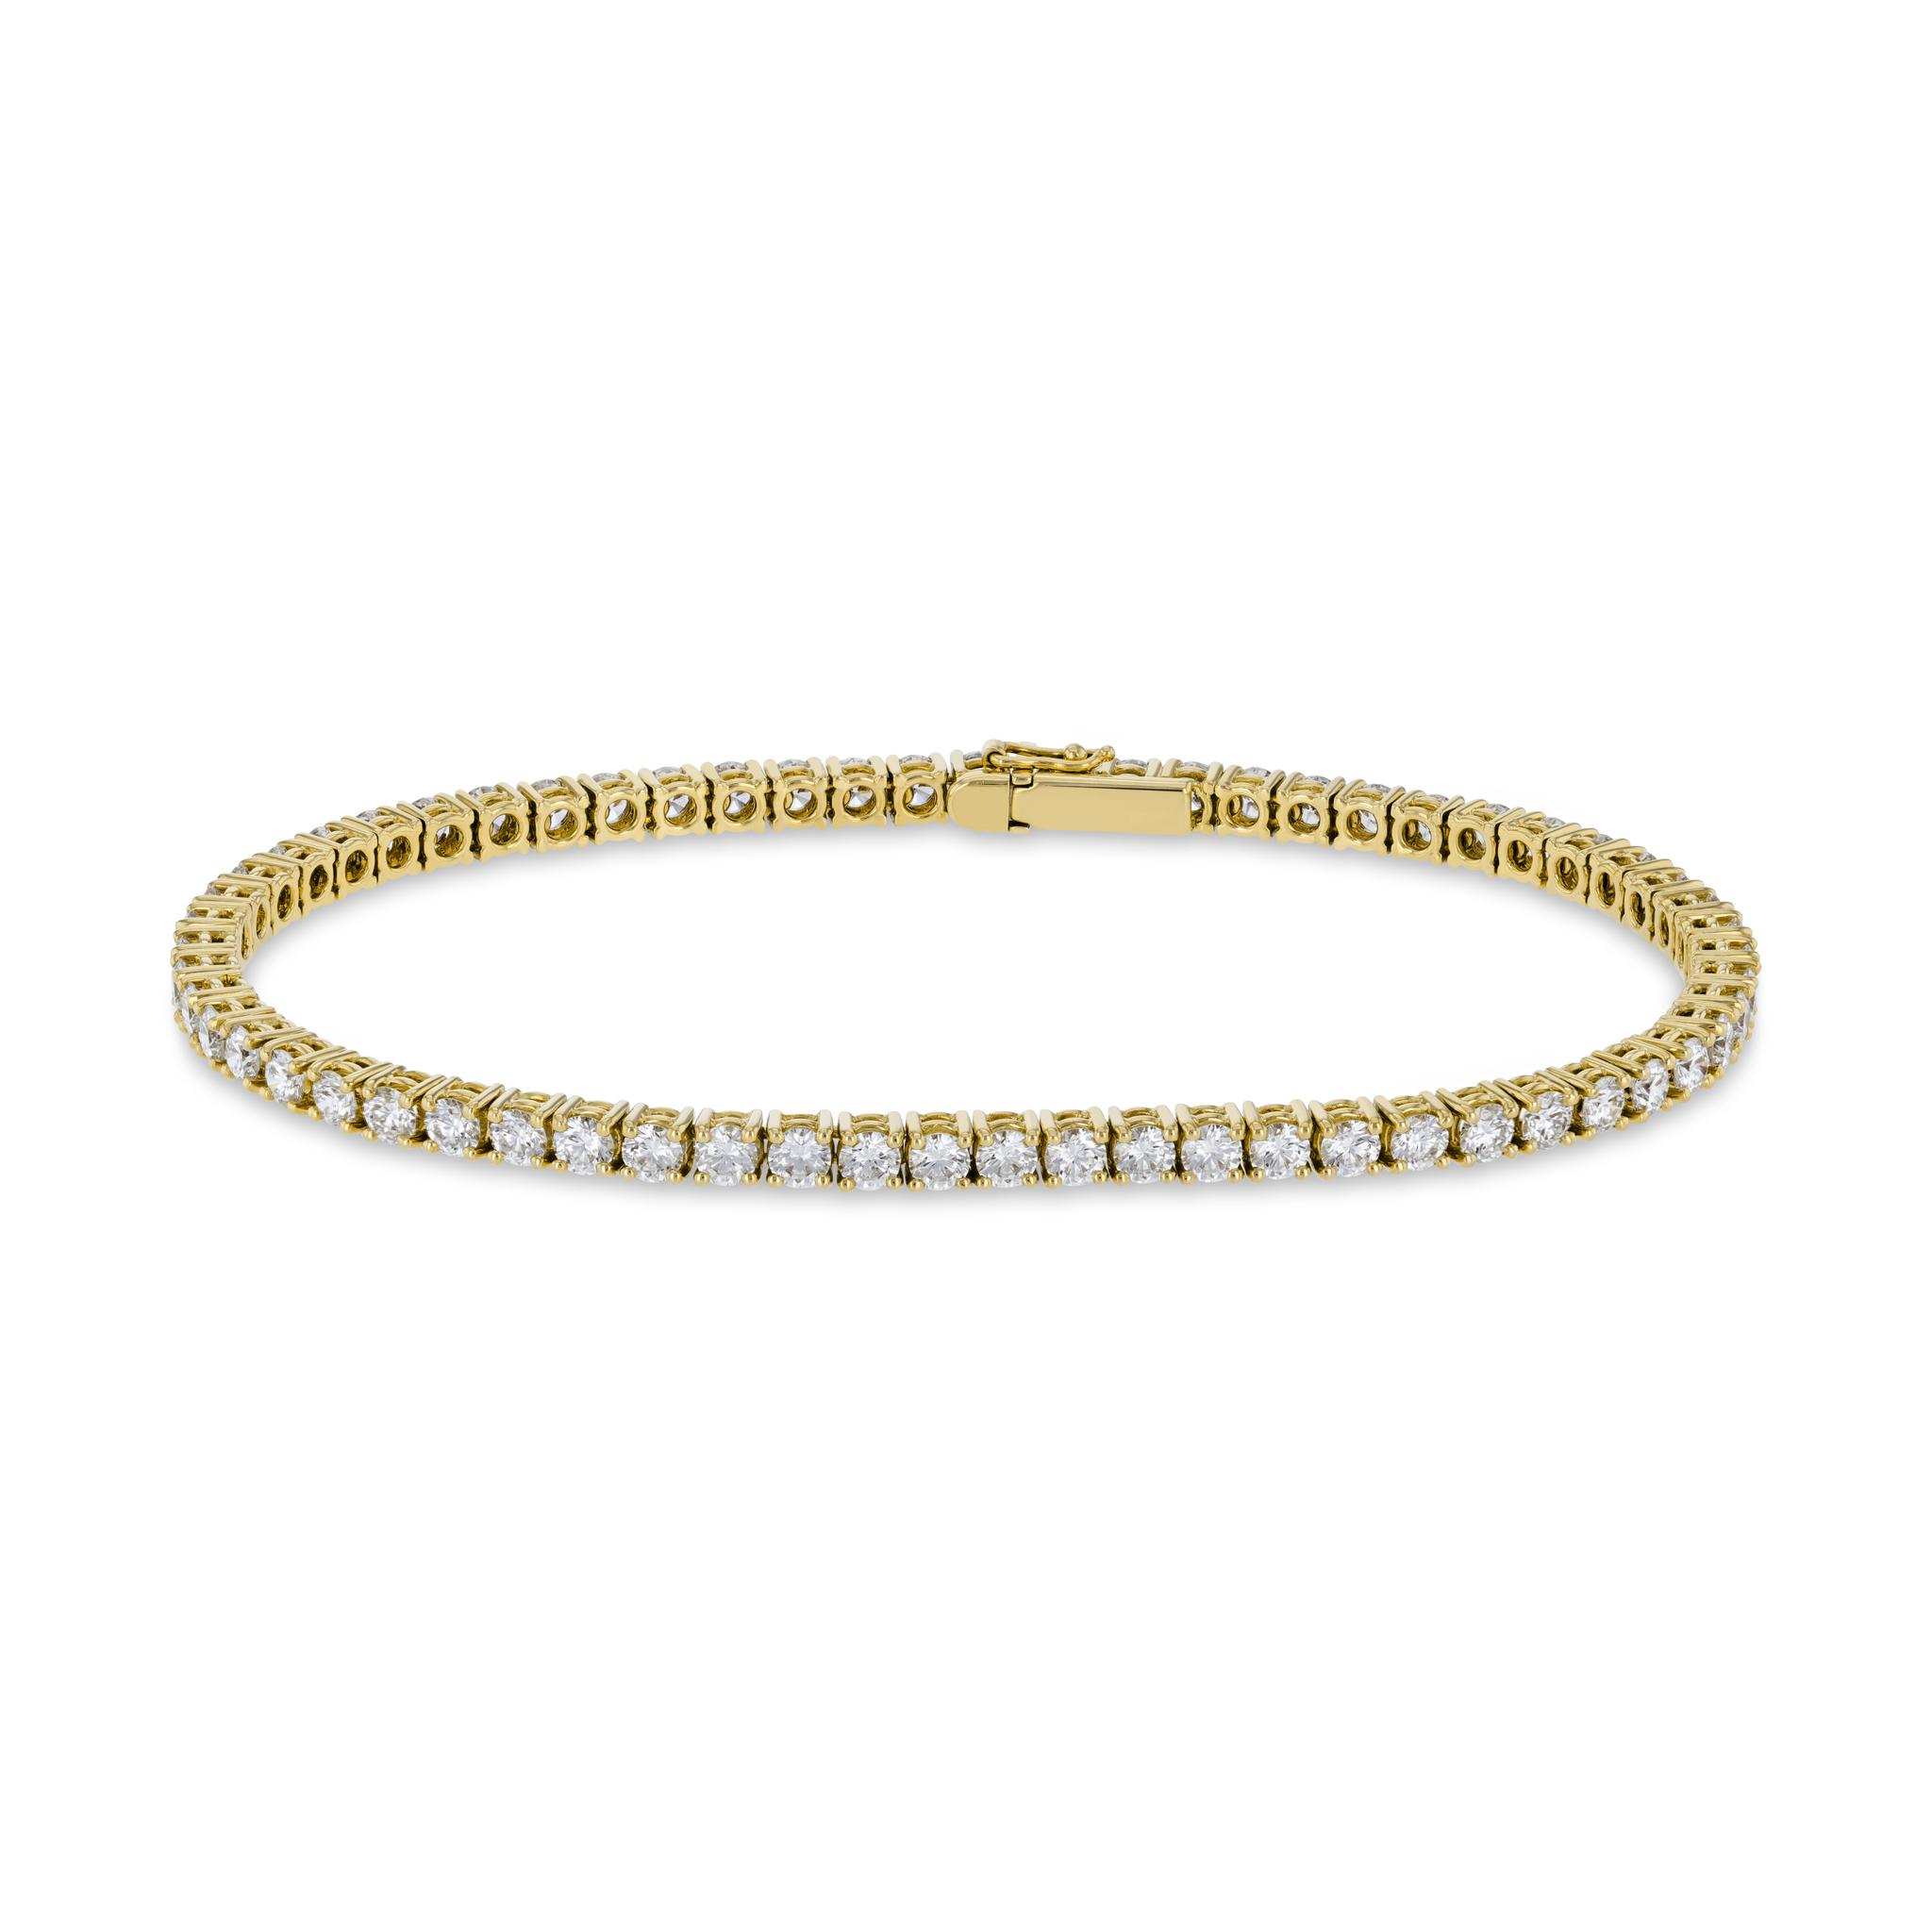 Riviere bracelet with diamonds